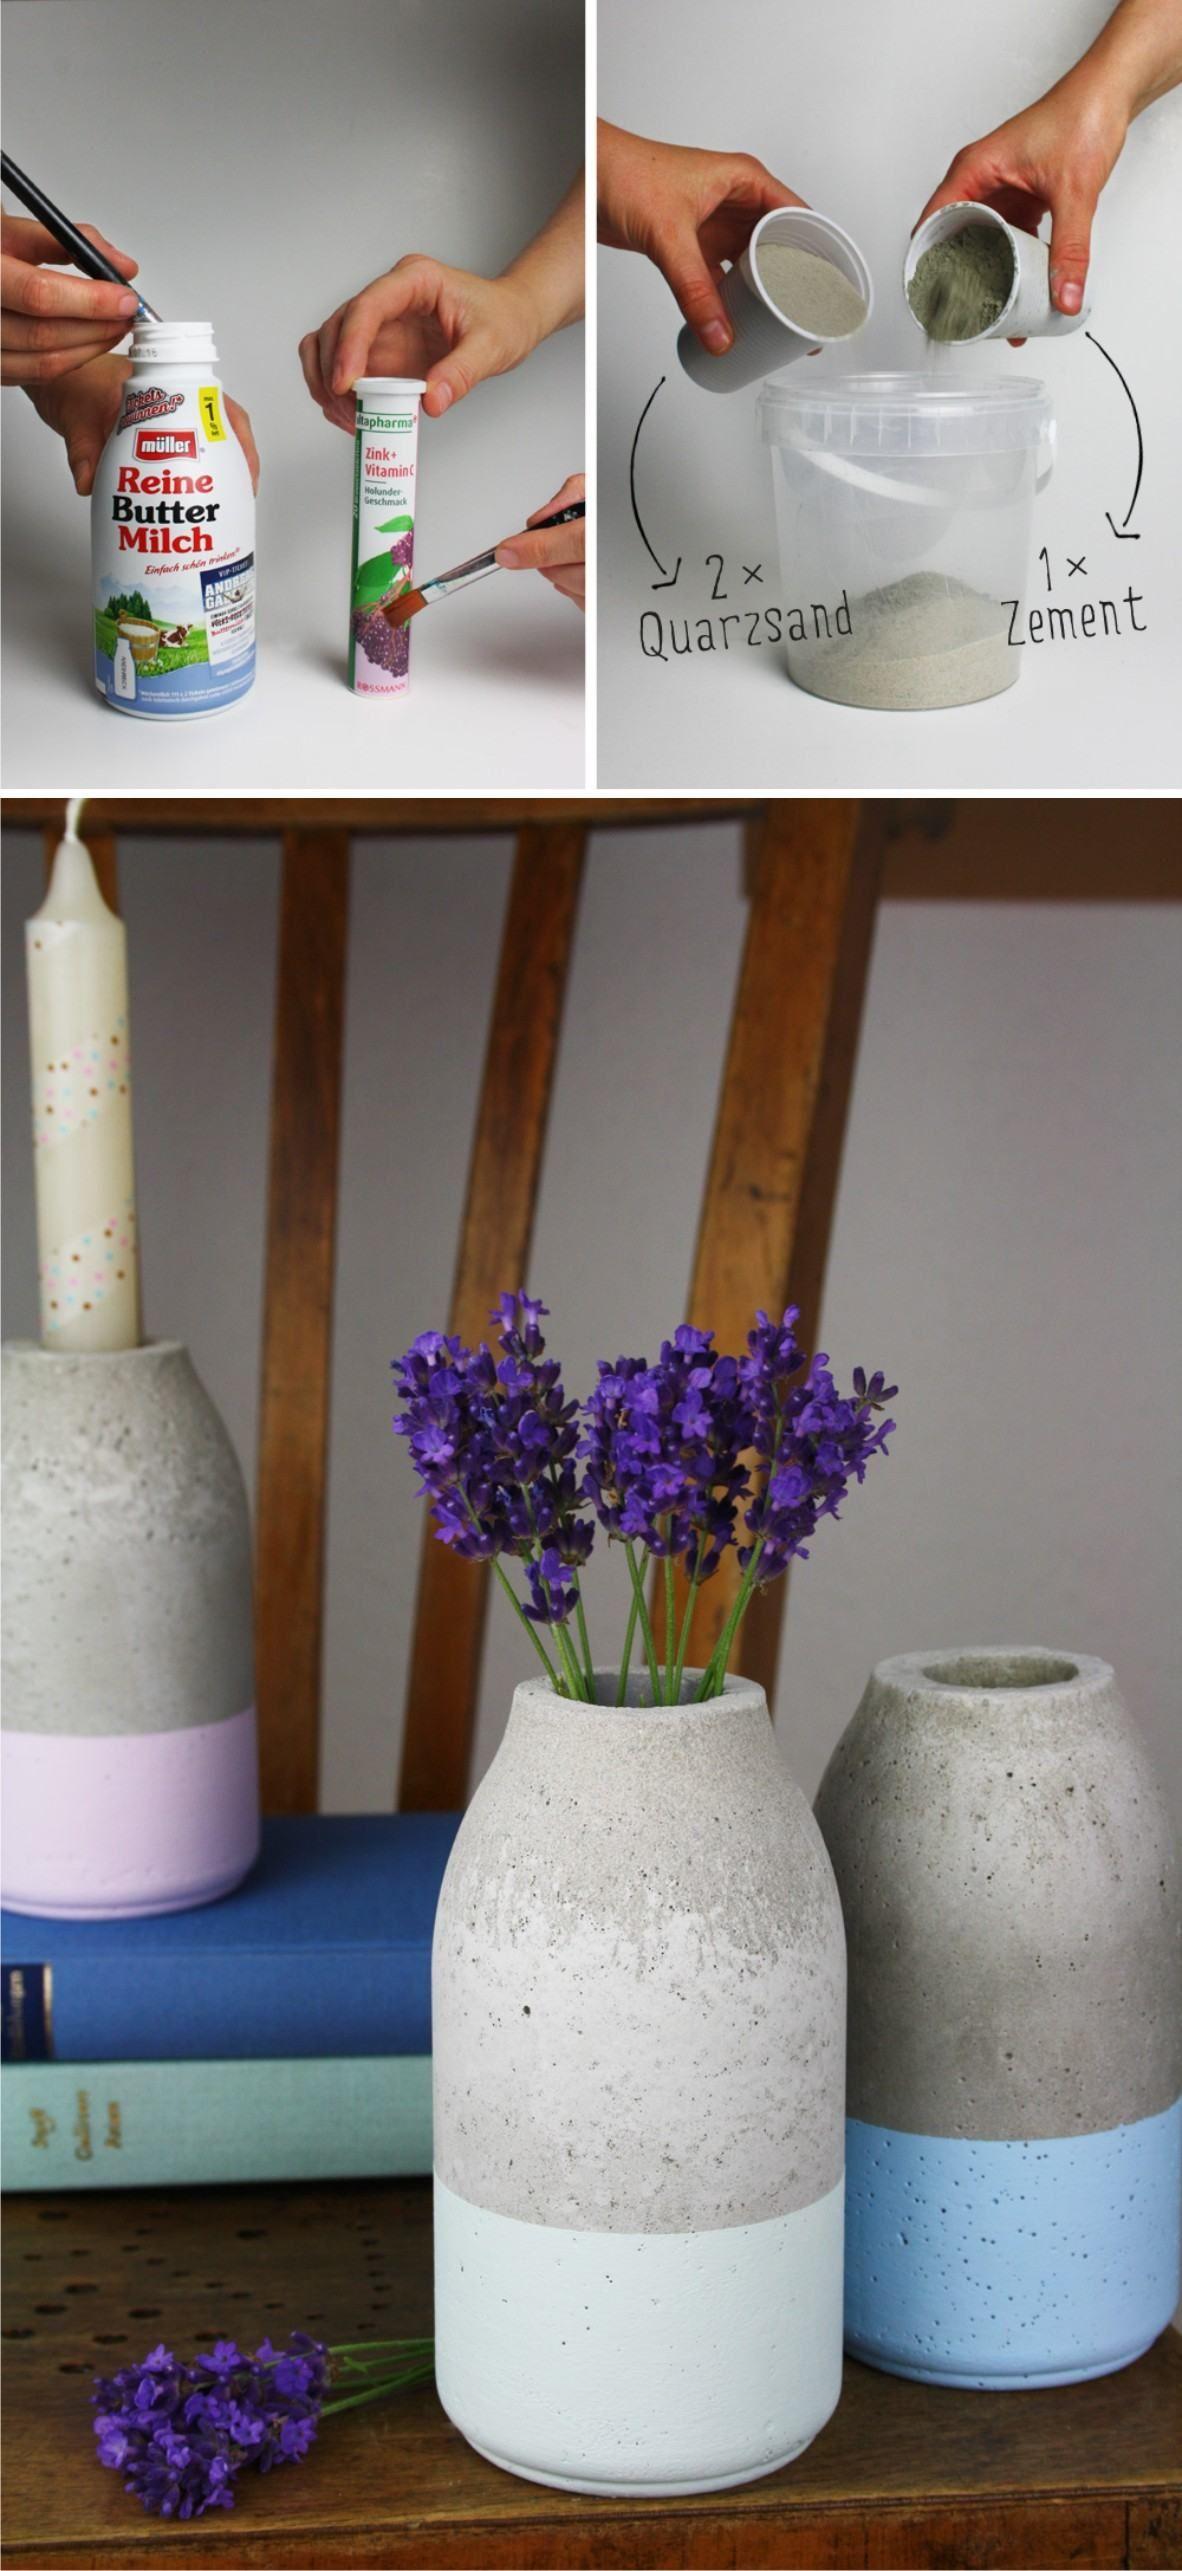 Beton Vasen Selber Machen florero diy de hormigón beton diy diy und selbermachen und diy beton